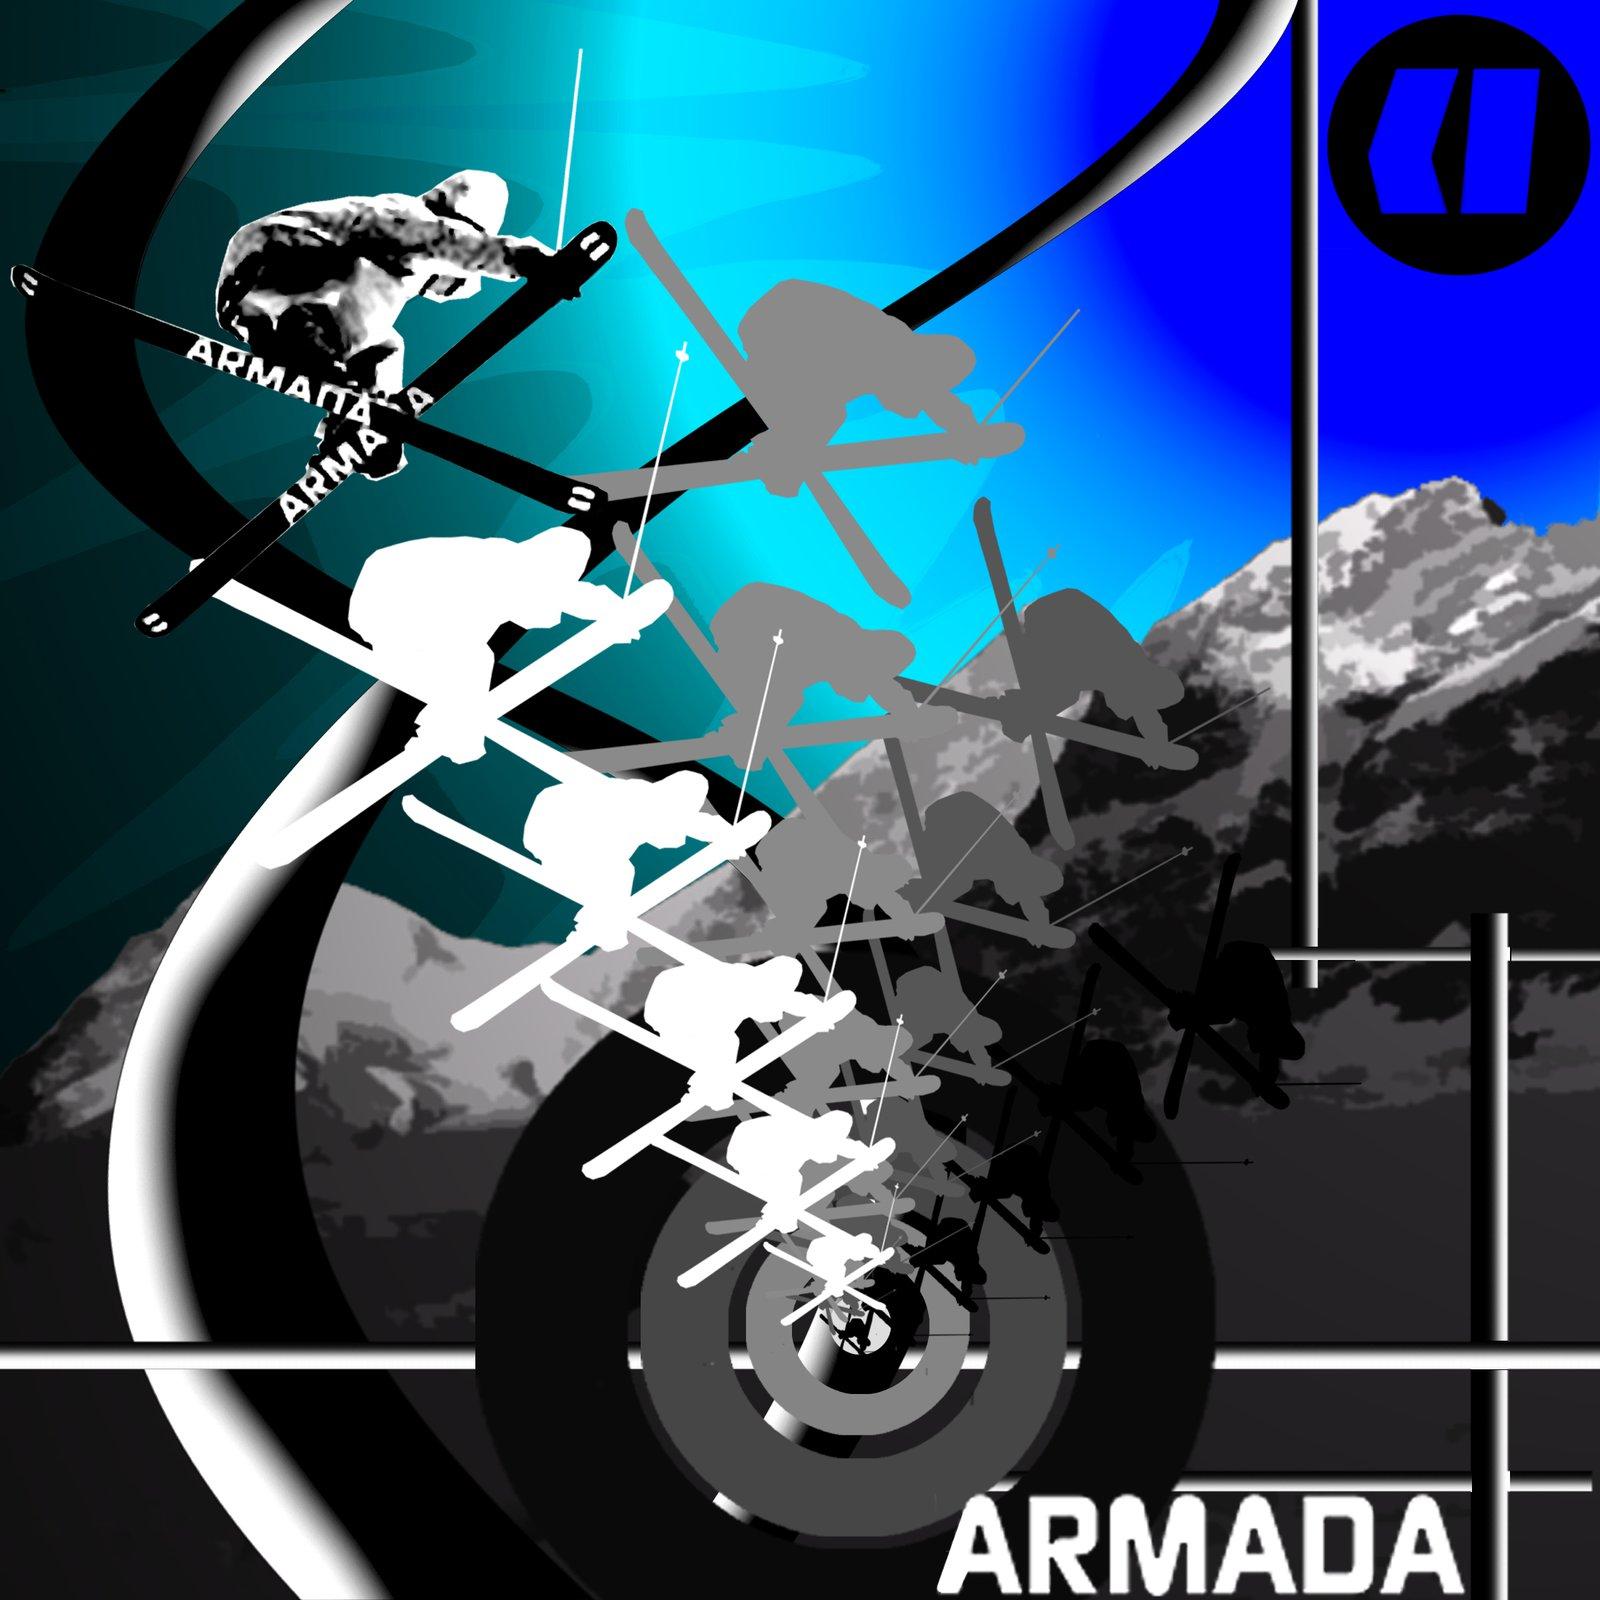 Armada poster idea